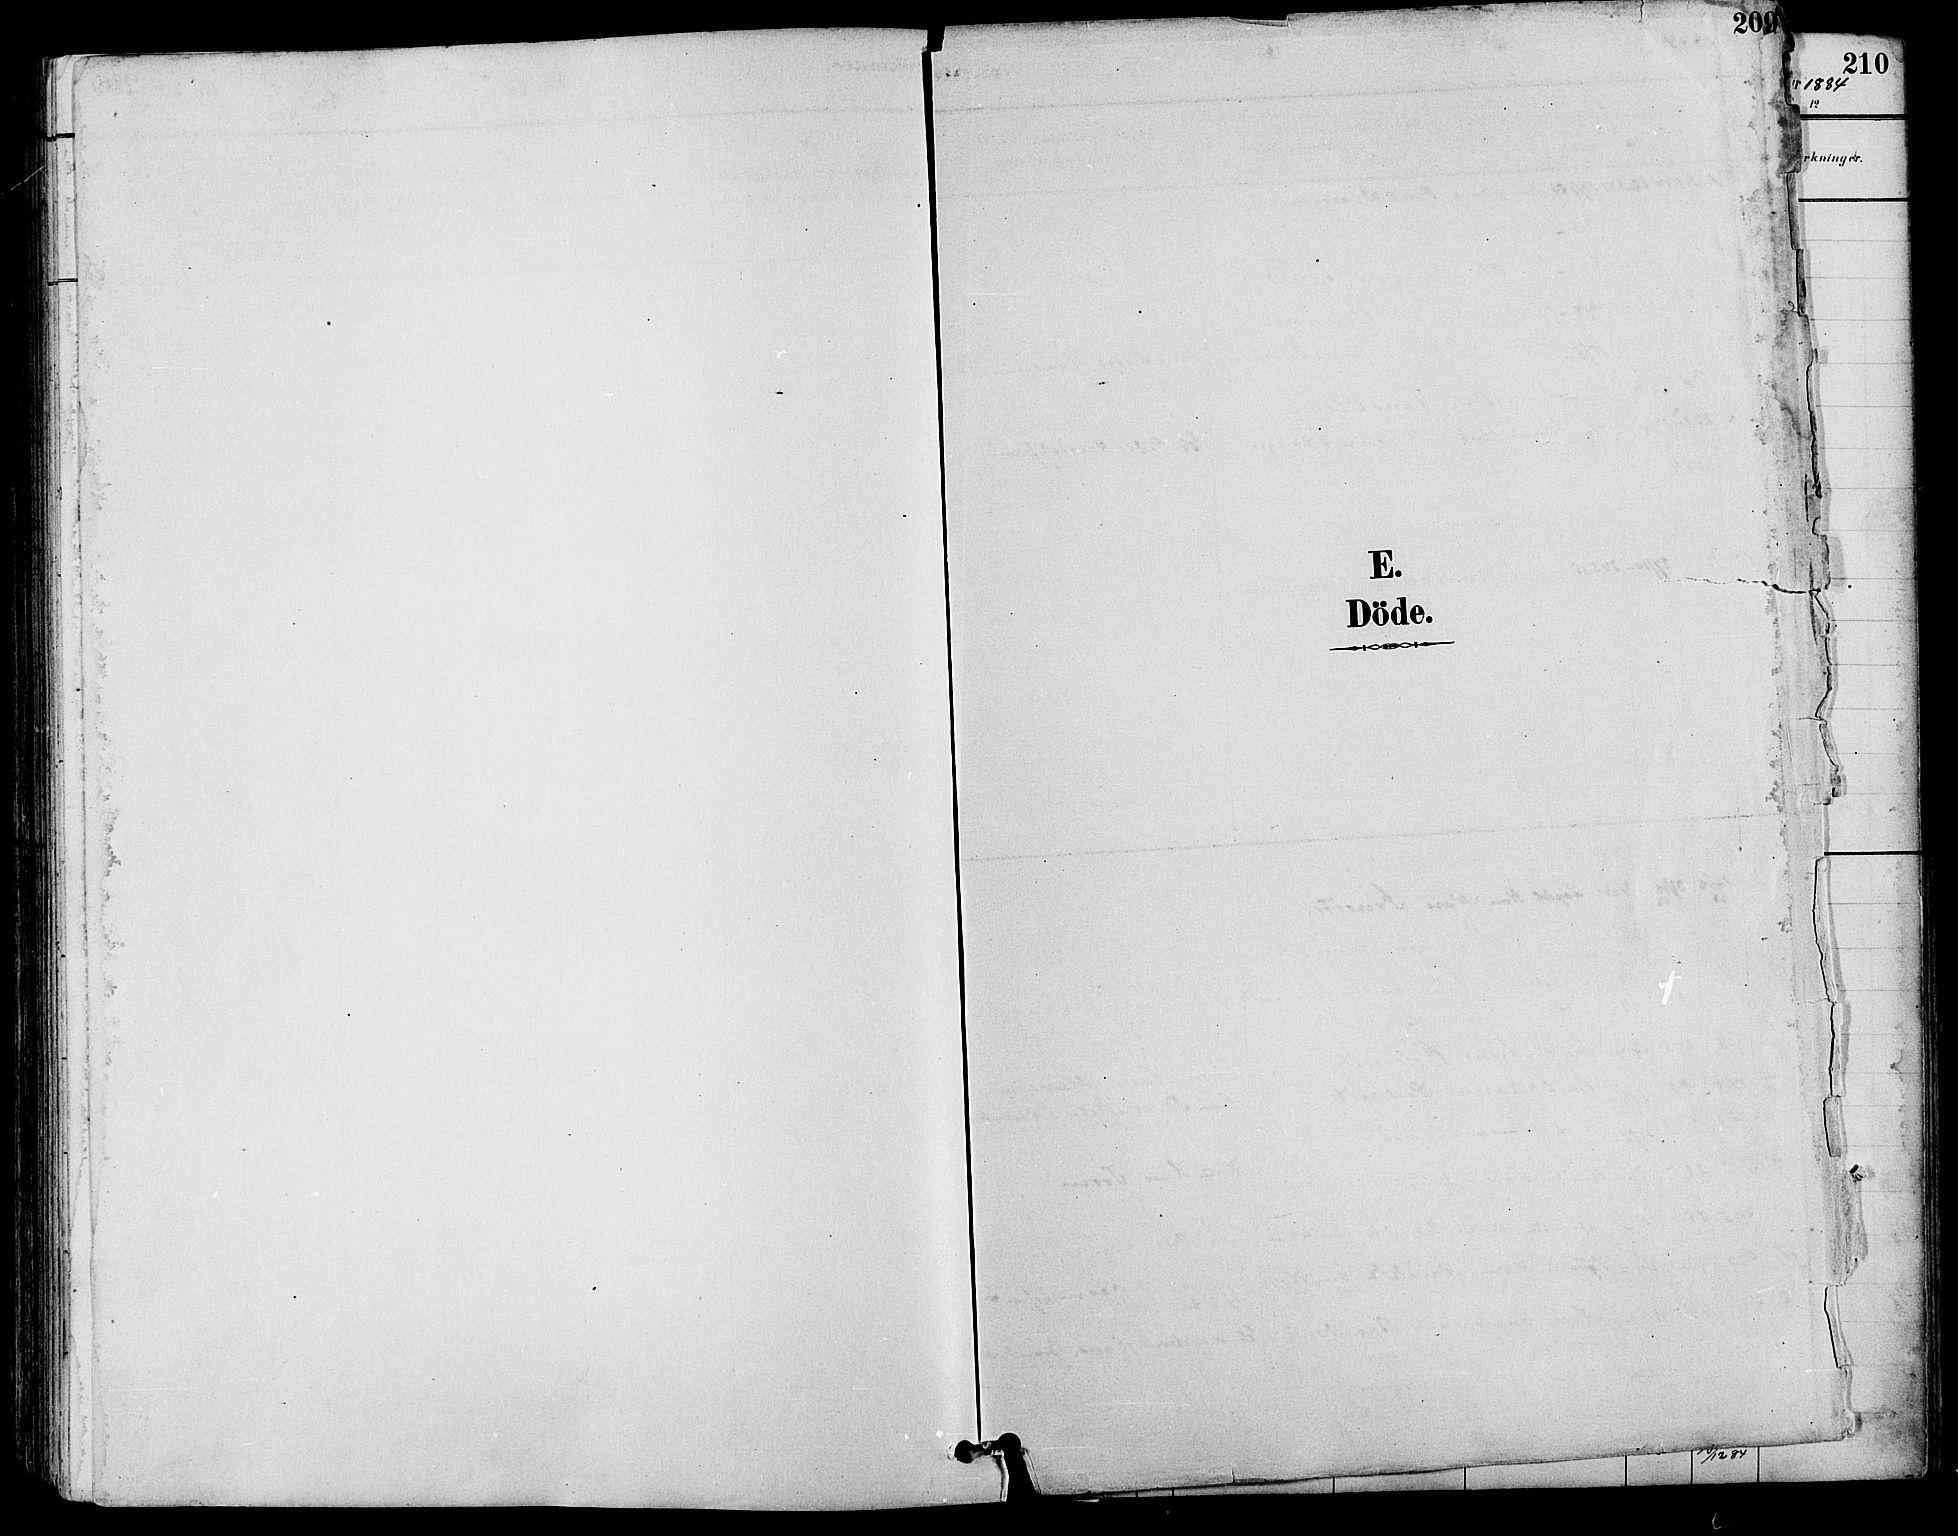 SAH, Nord-Fron prestekontor, Klokkerbok nr. 4, 1884-1914, s. 209